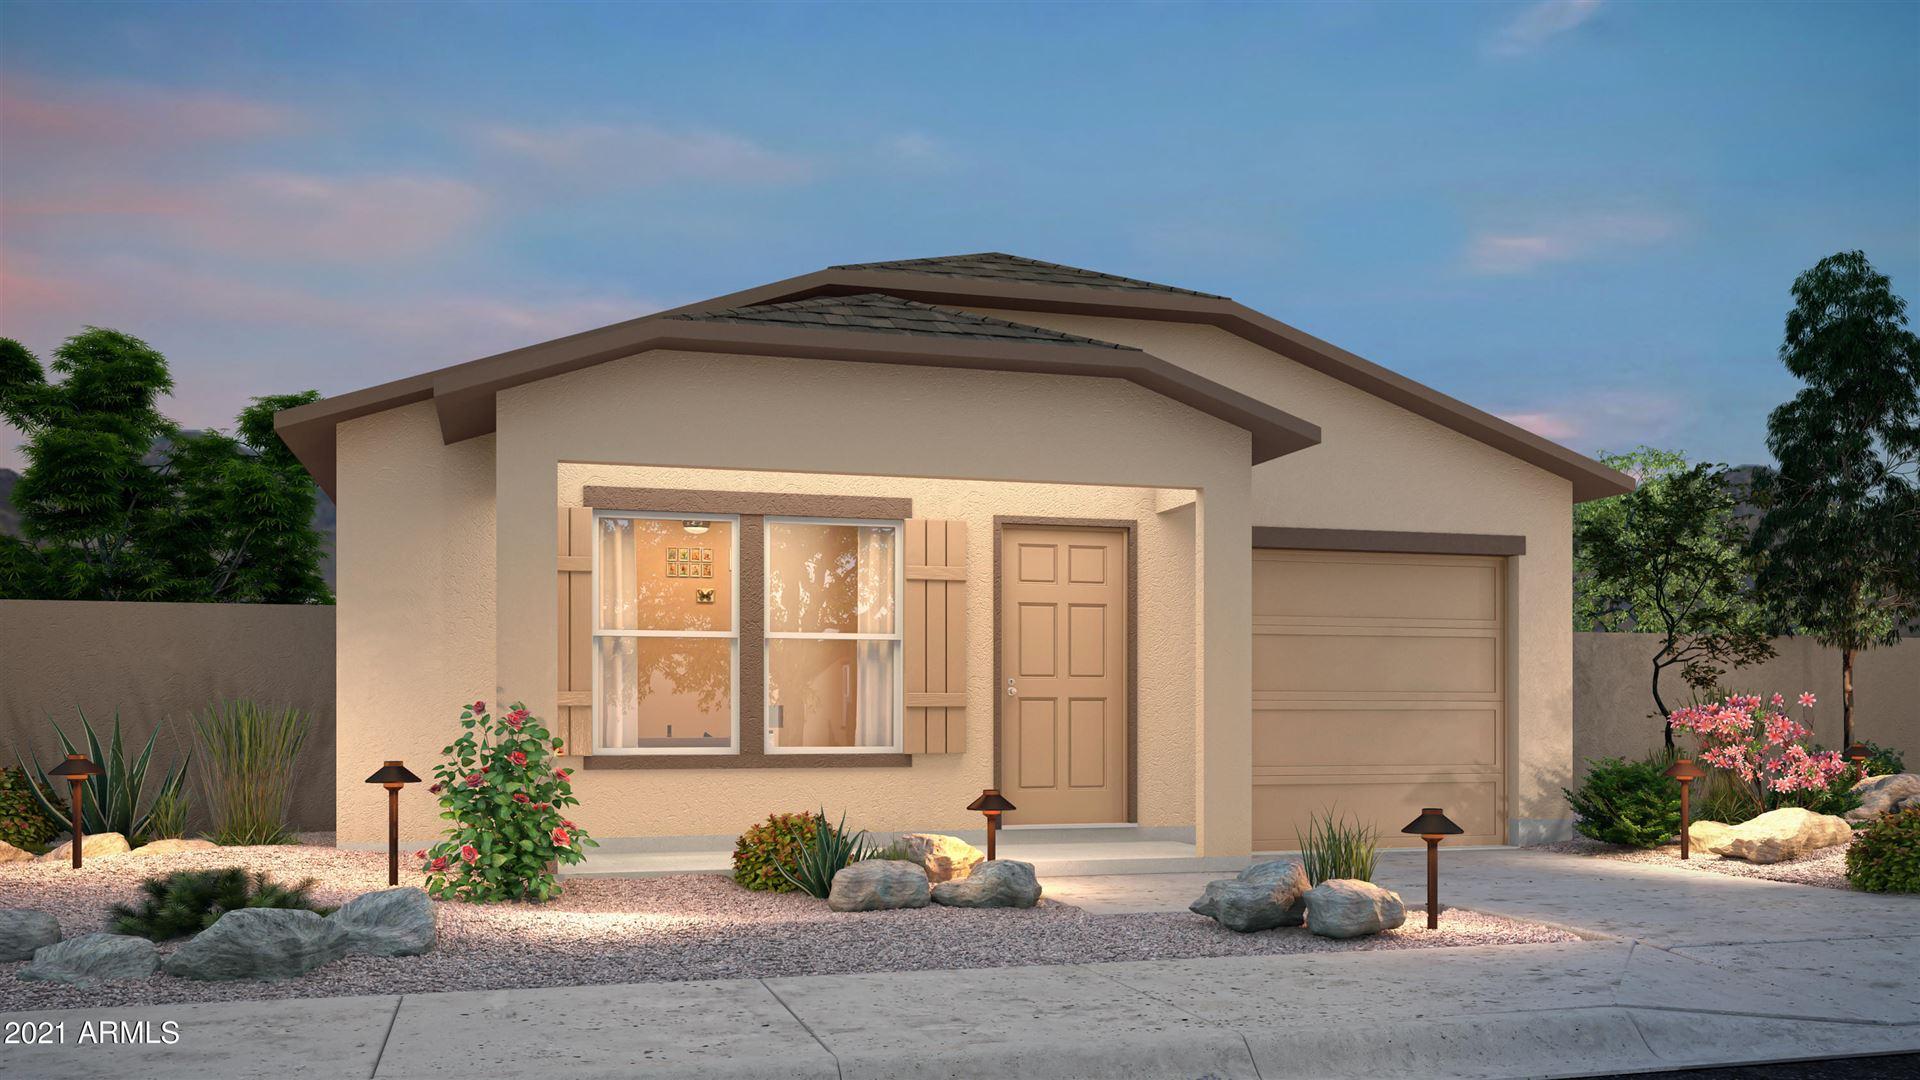 Photo of 188 Arkin Circle, Morristown, AZ 85342 (MLS # 6190341)